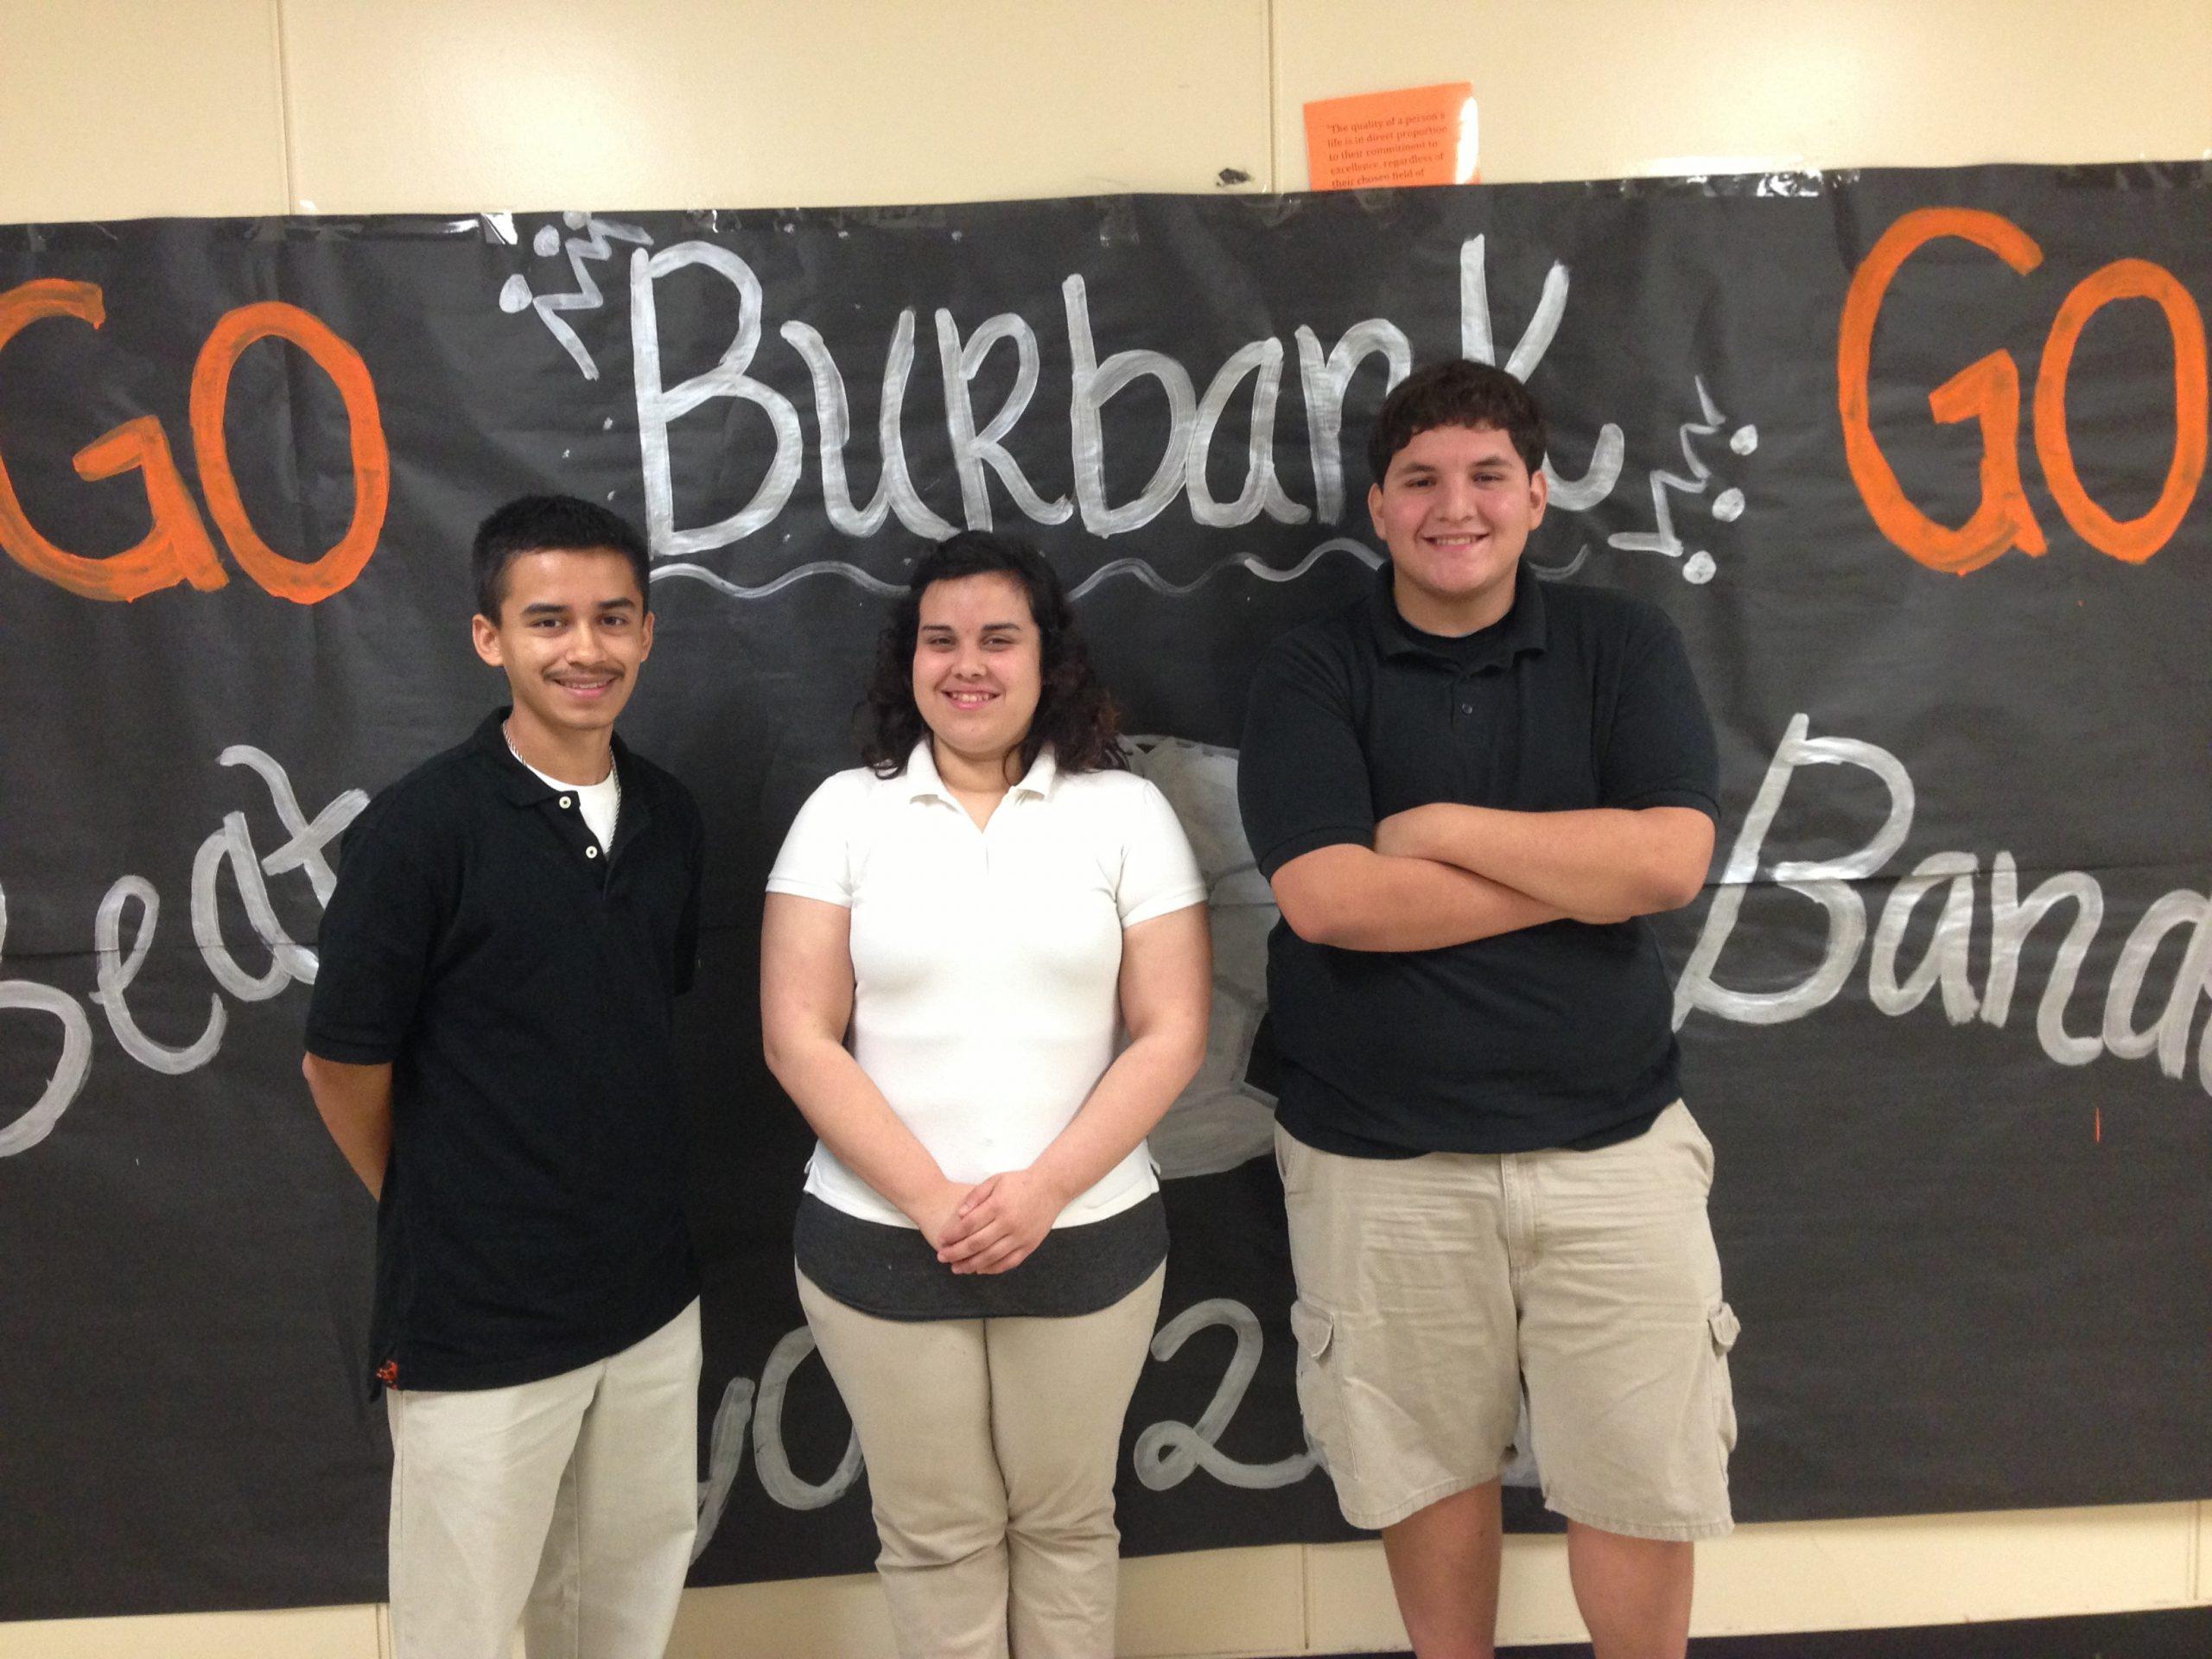 James Garza, Eliza Almeida-Trejo, and Nathaniel Saenz are college bound in a big way - Go, Burbank, Go! Photo by Bekah McNeel.